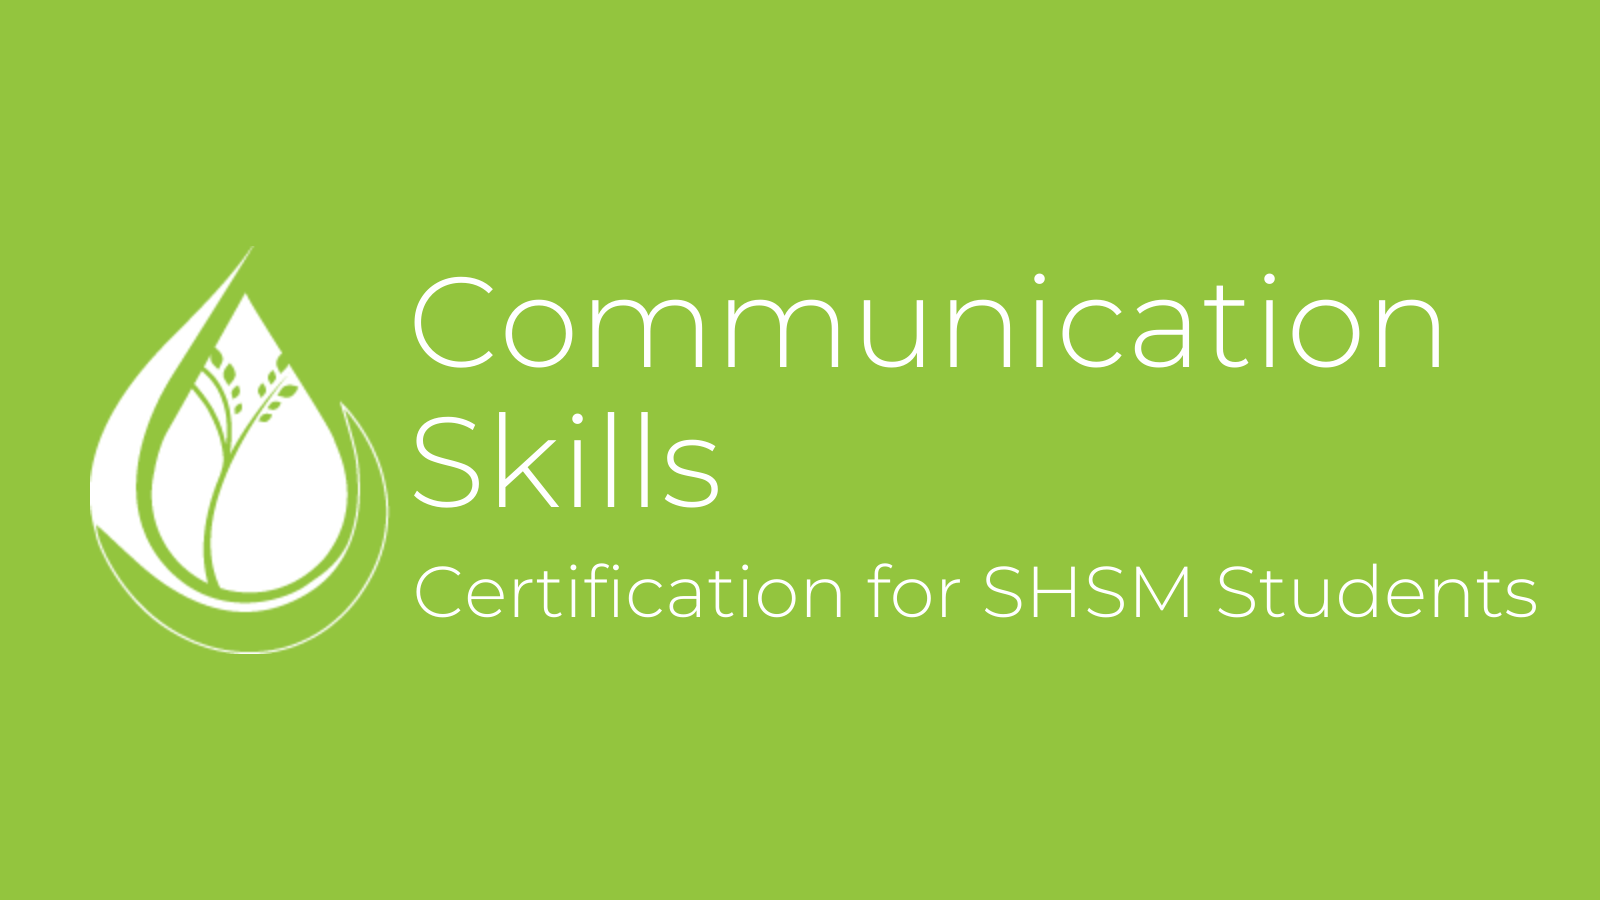 Communication Skills - Certification for SHSM Students